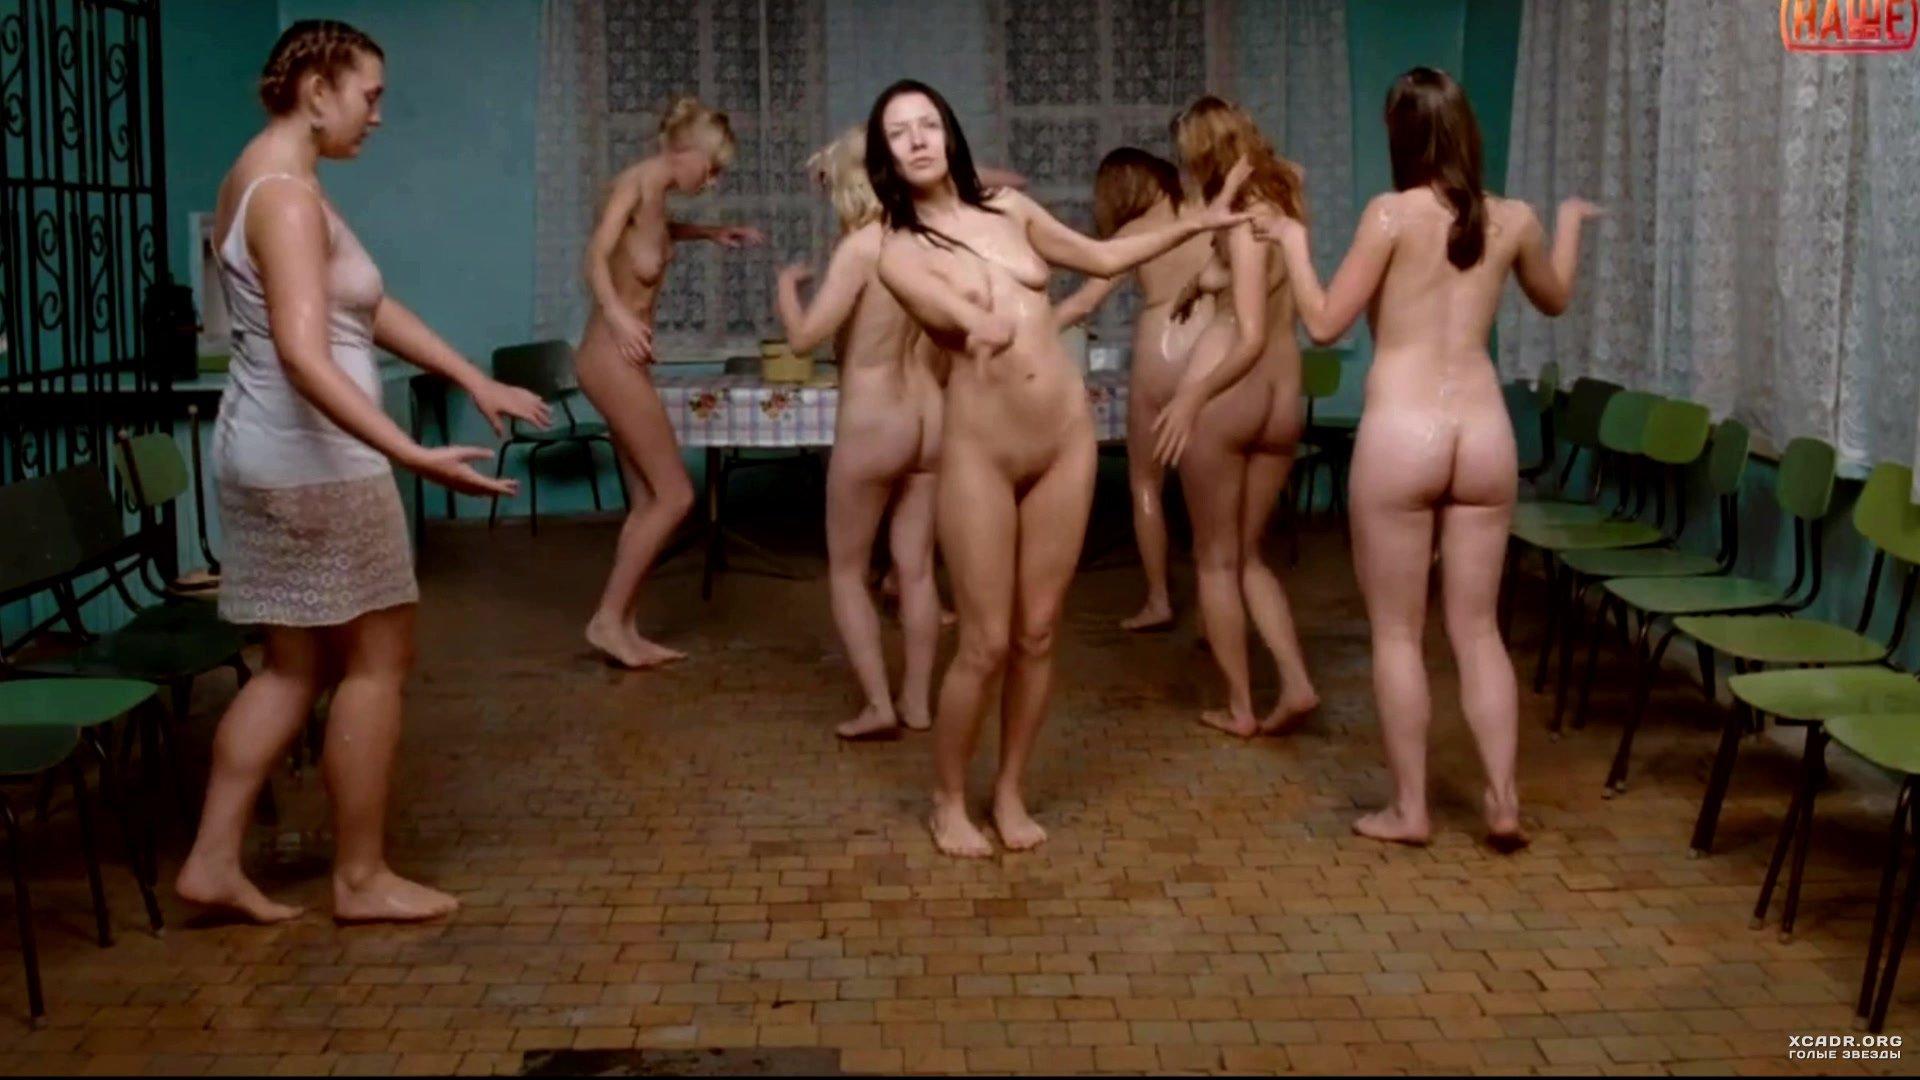 съемки эротического фильма общага